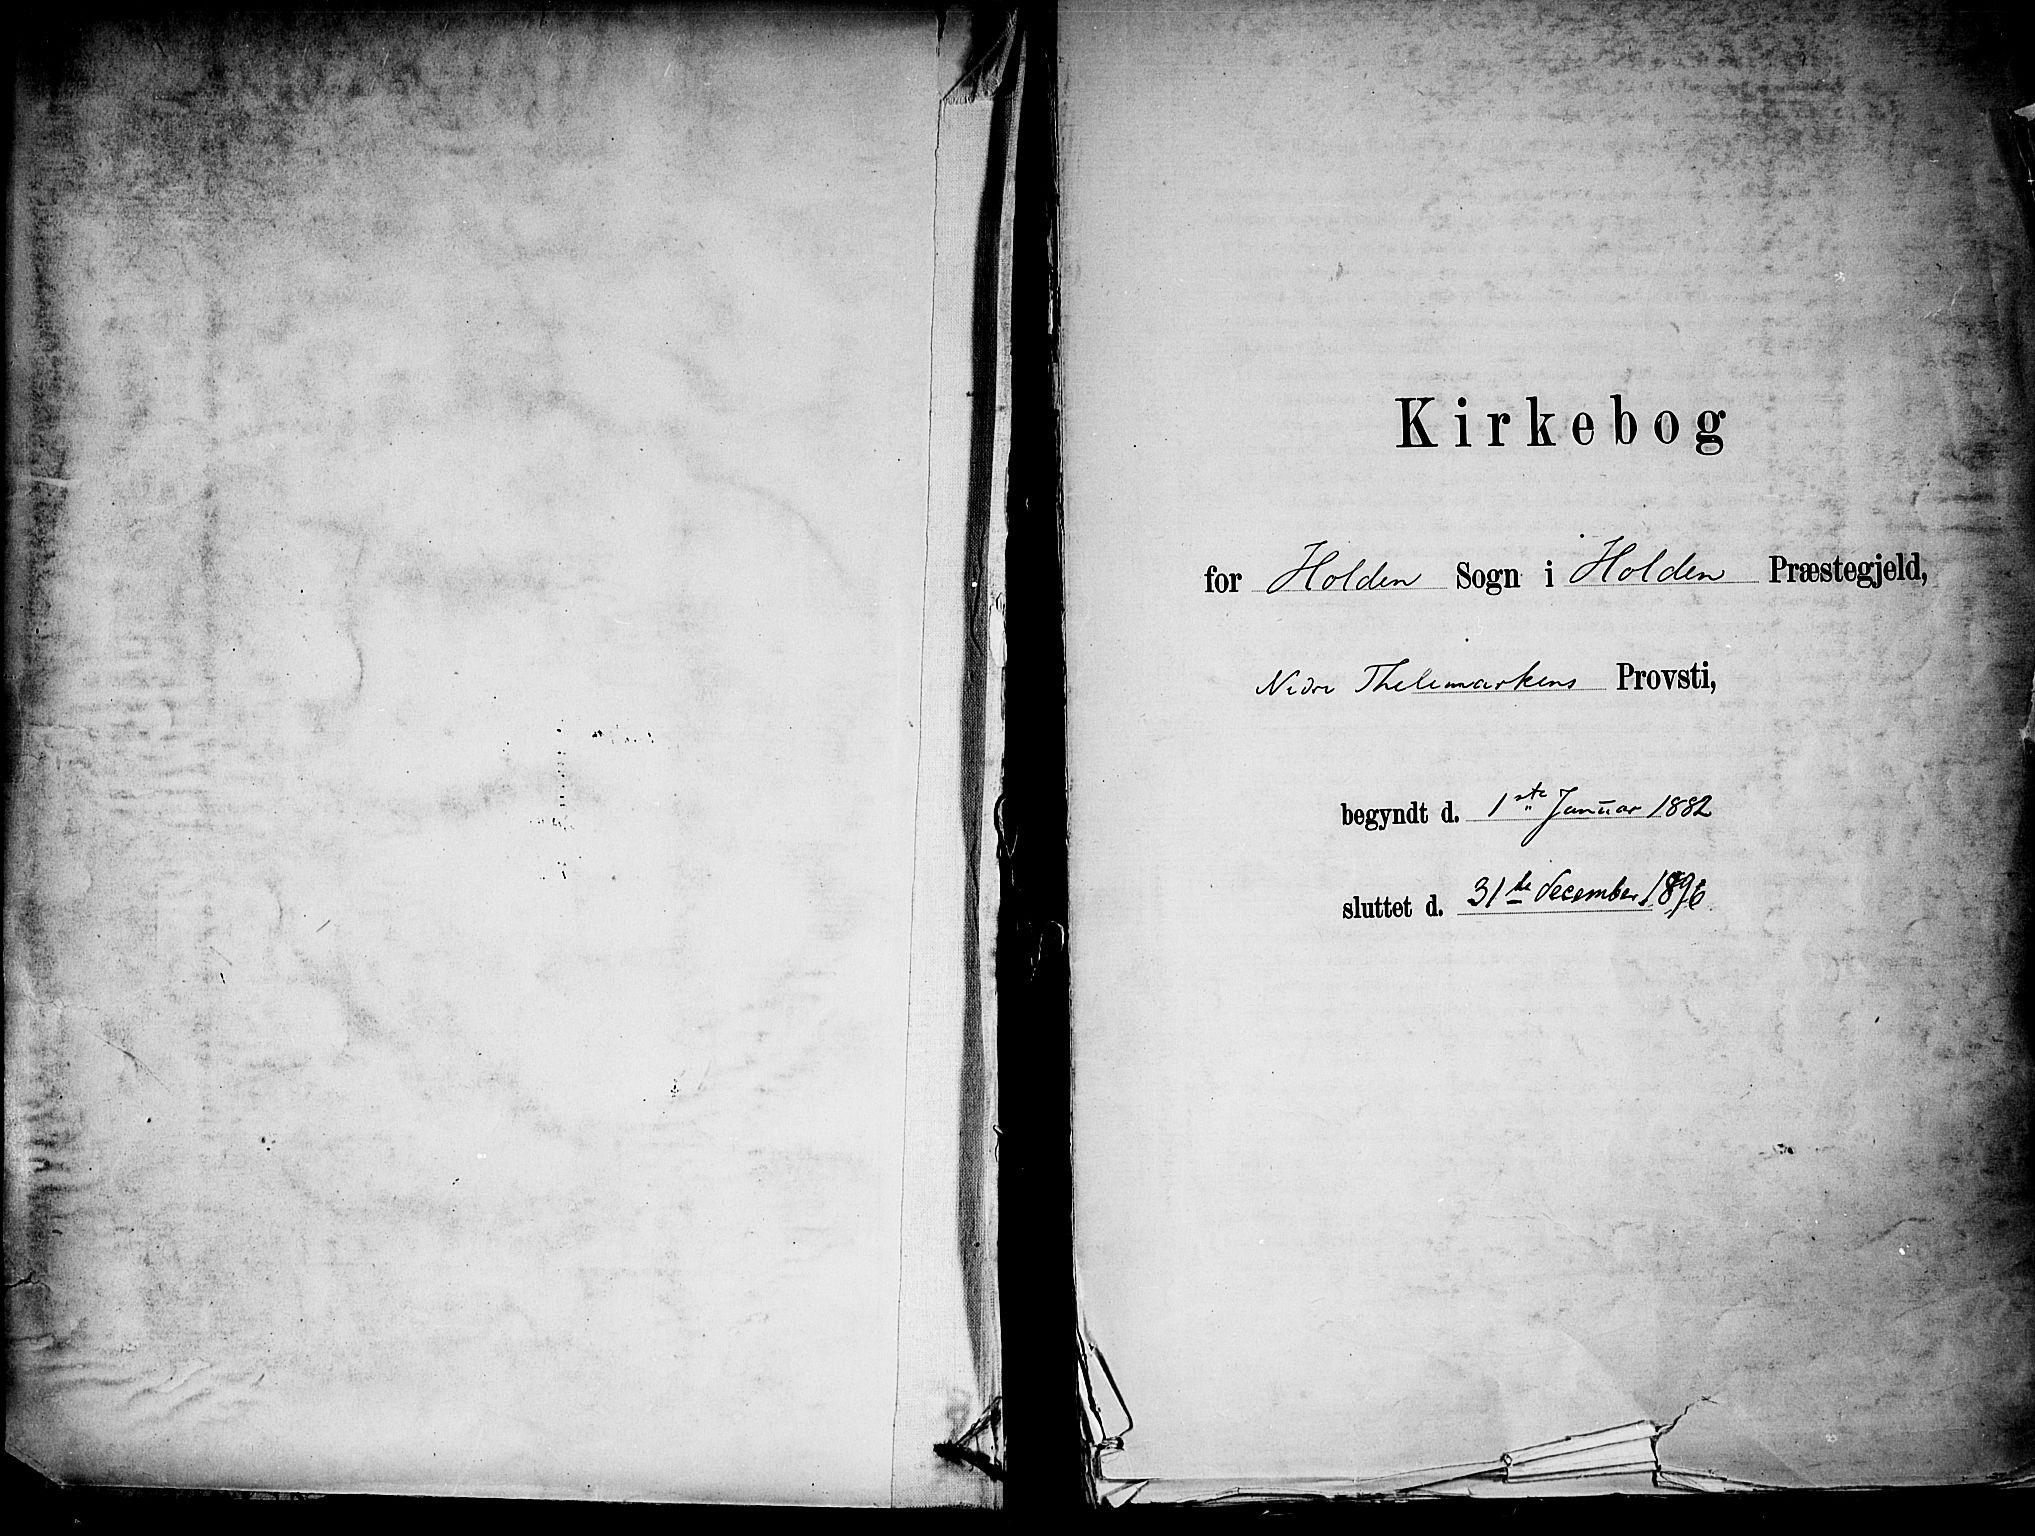 SAKO, Holla kirkebøker, F/Fa/L0008: Ministerialbok nr. 8, 1882-1897